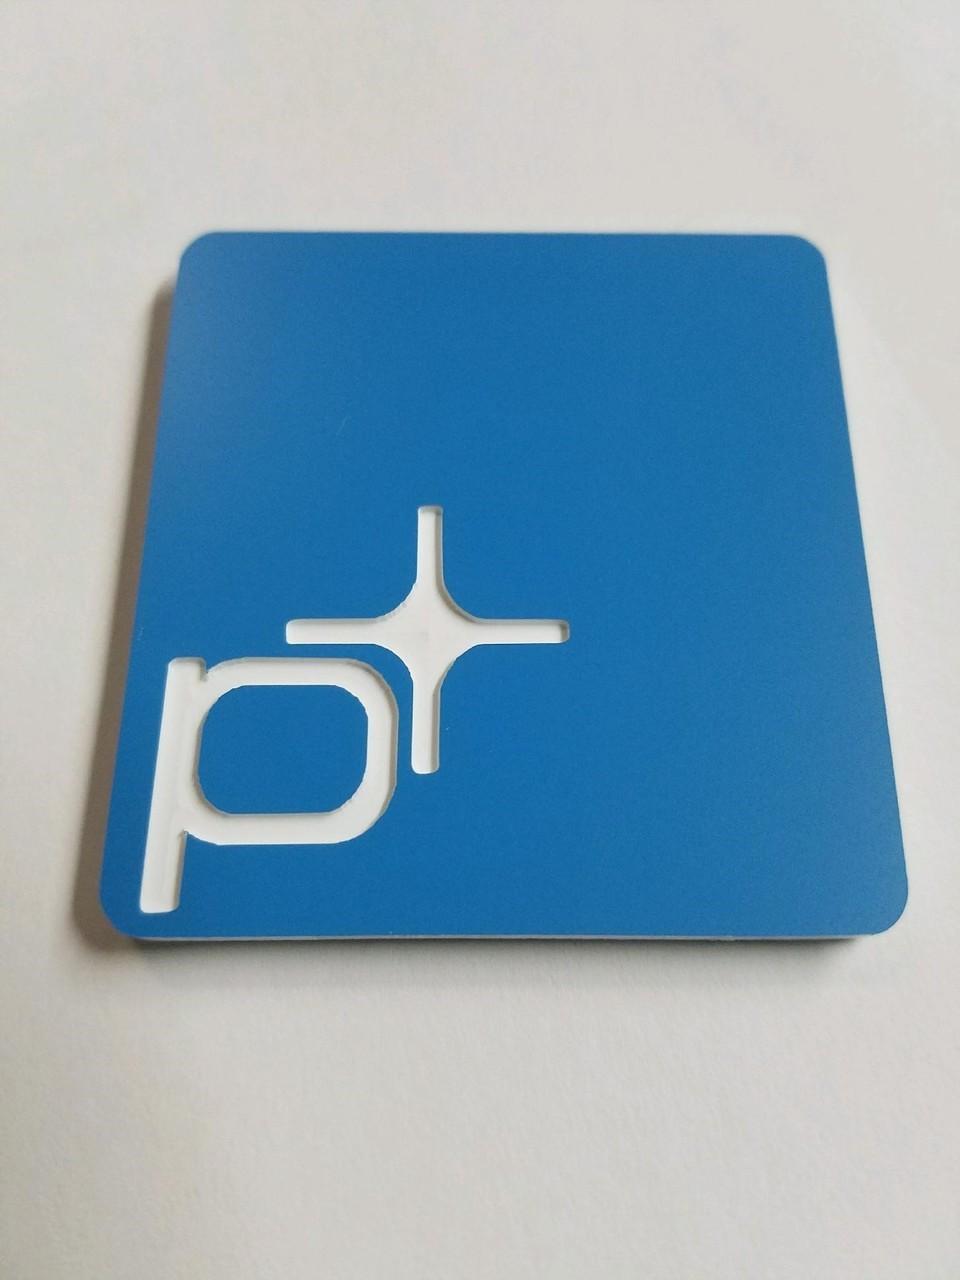 P* Volvo Badges